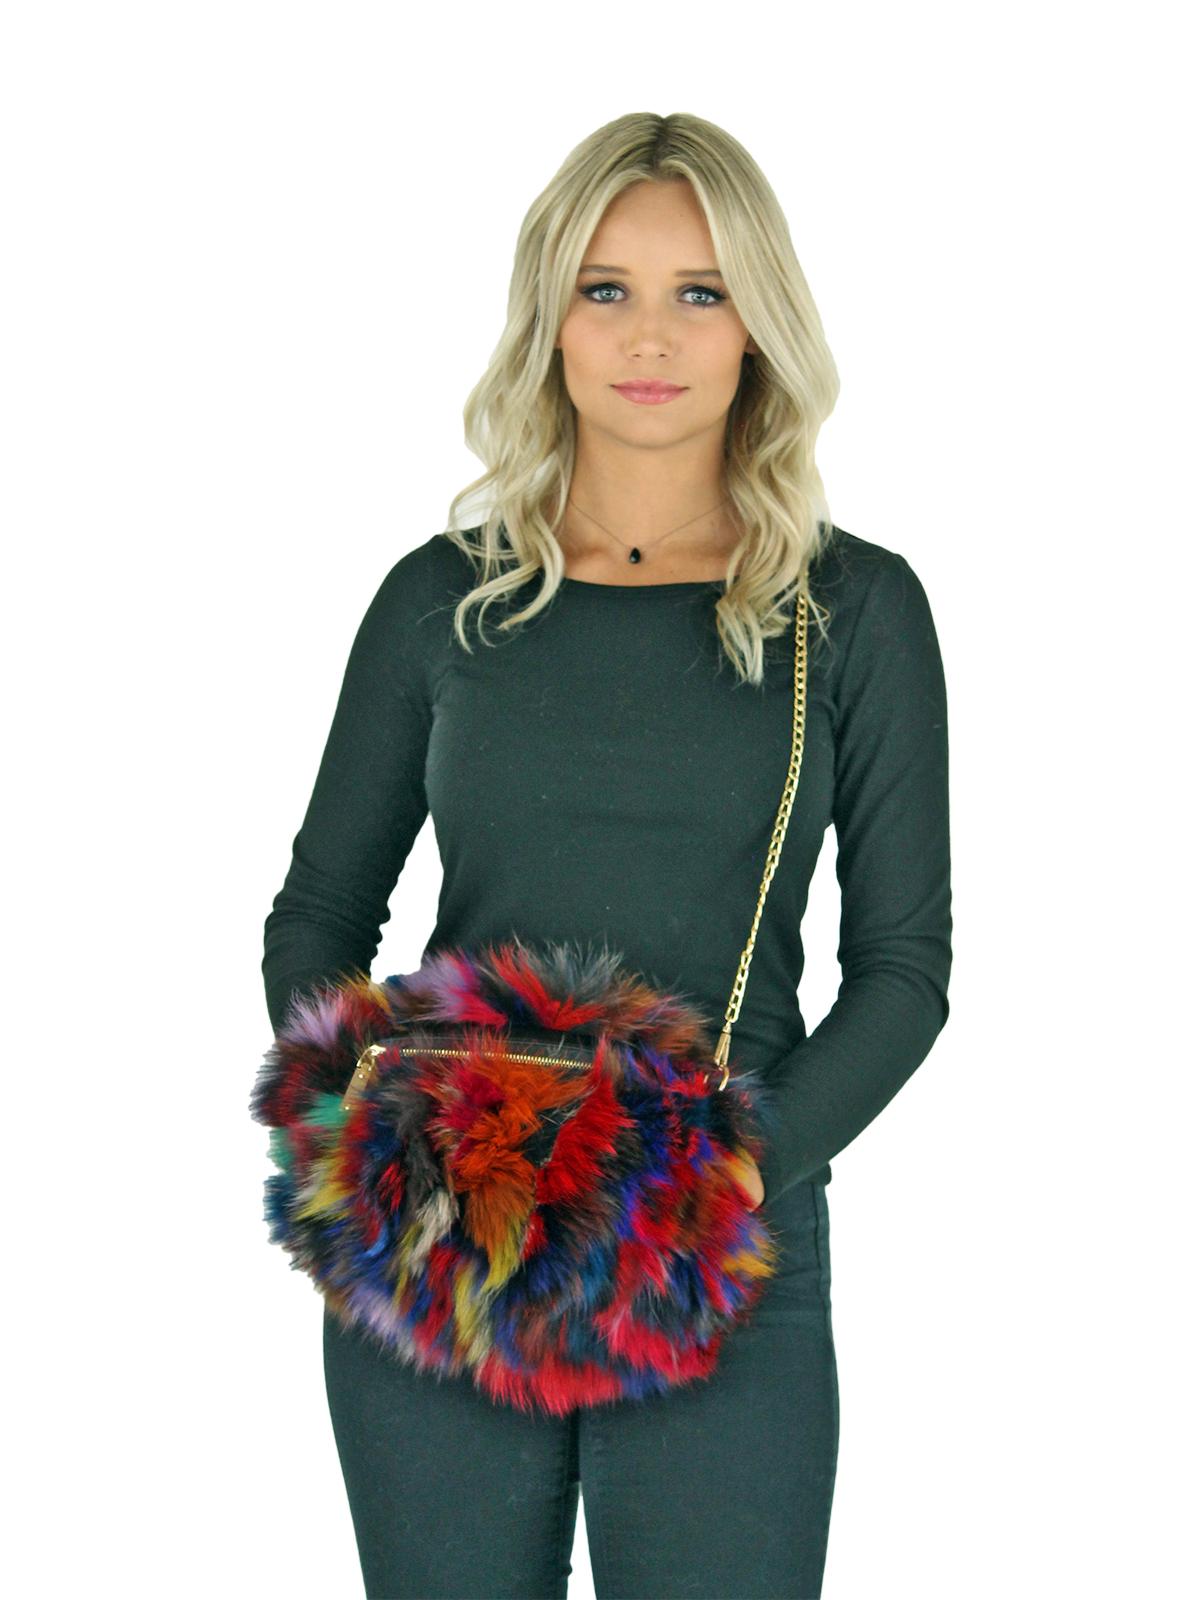 Woman's Multicolor Fox Fur Purse and Hand Muff